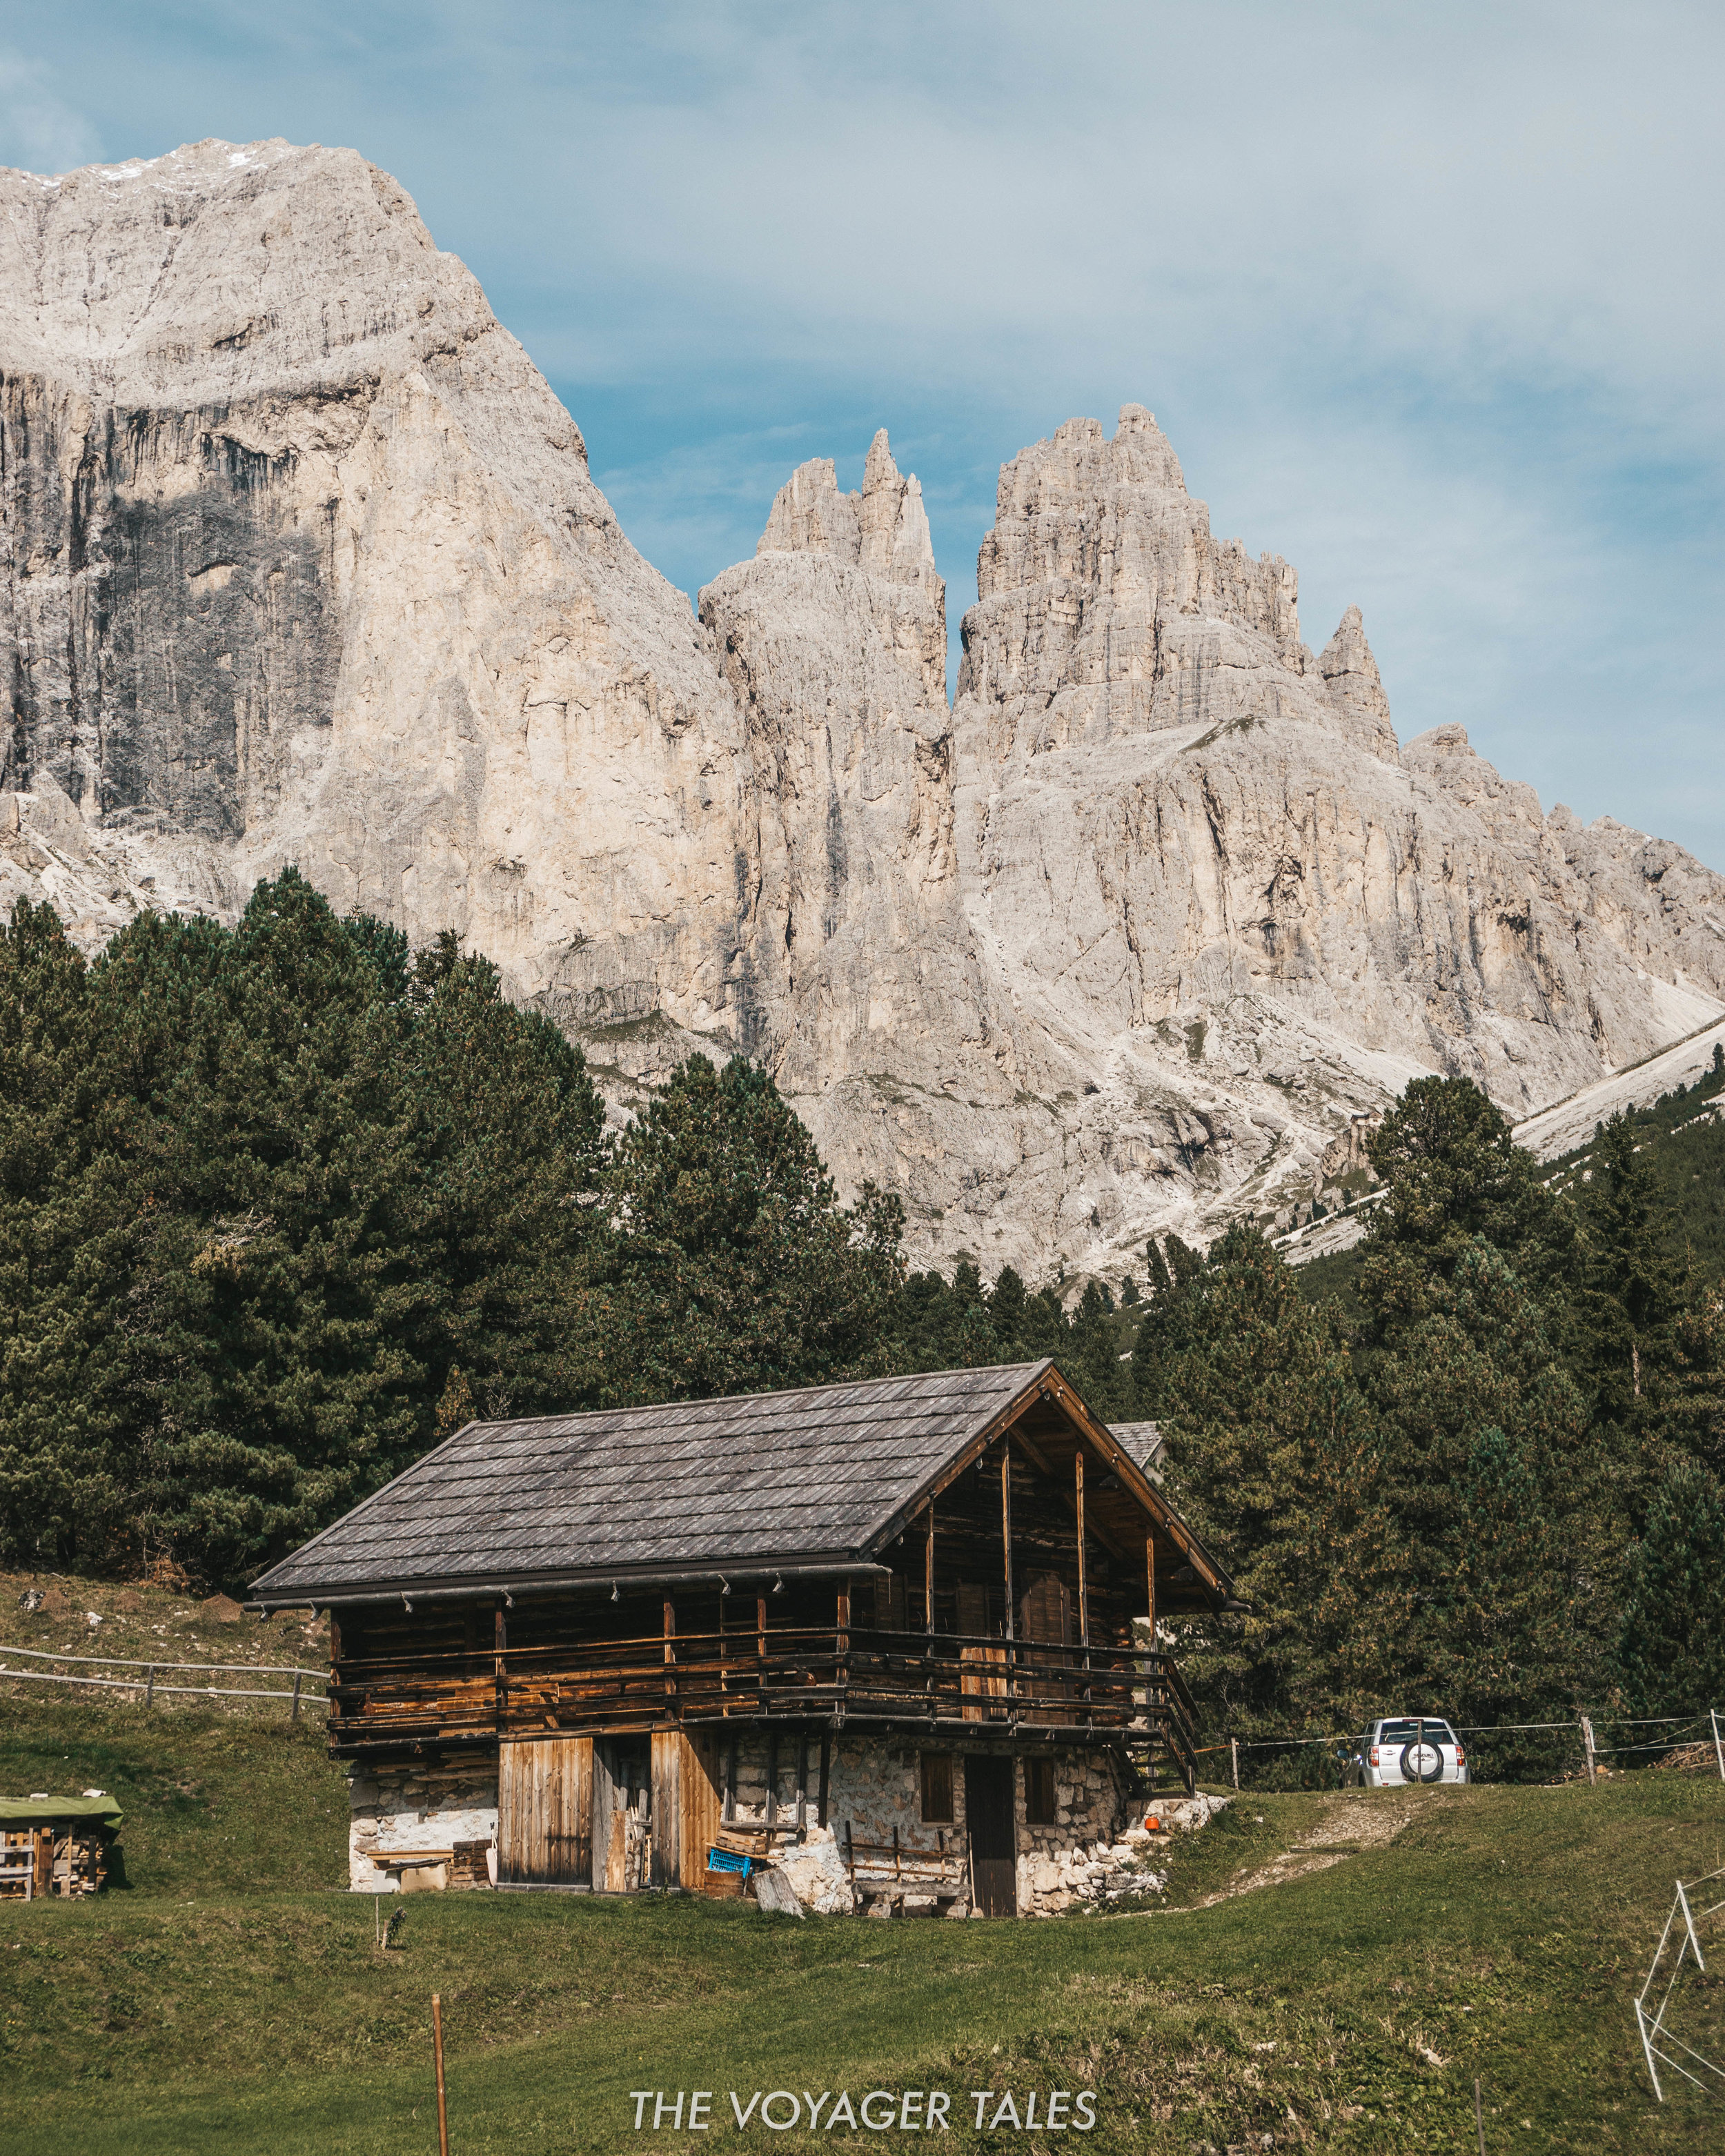 A classic Italian mountain hut in the Rosengarten Mountain, the Dolomites.